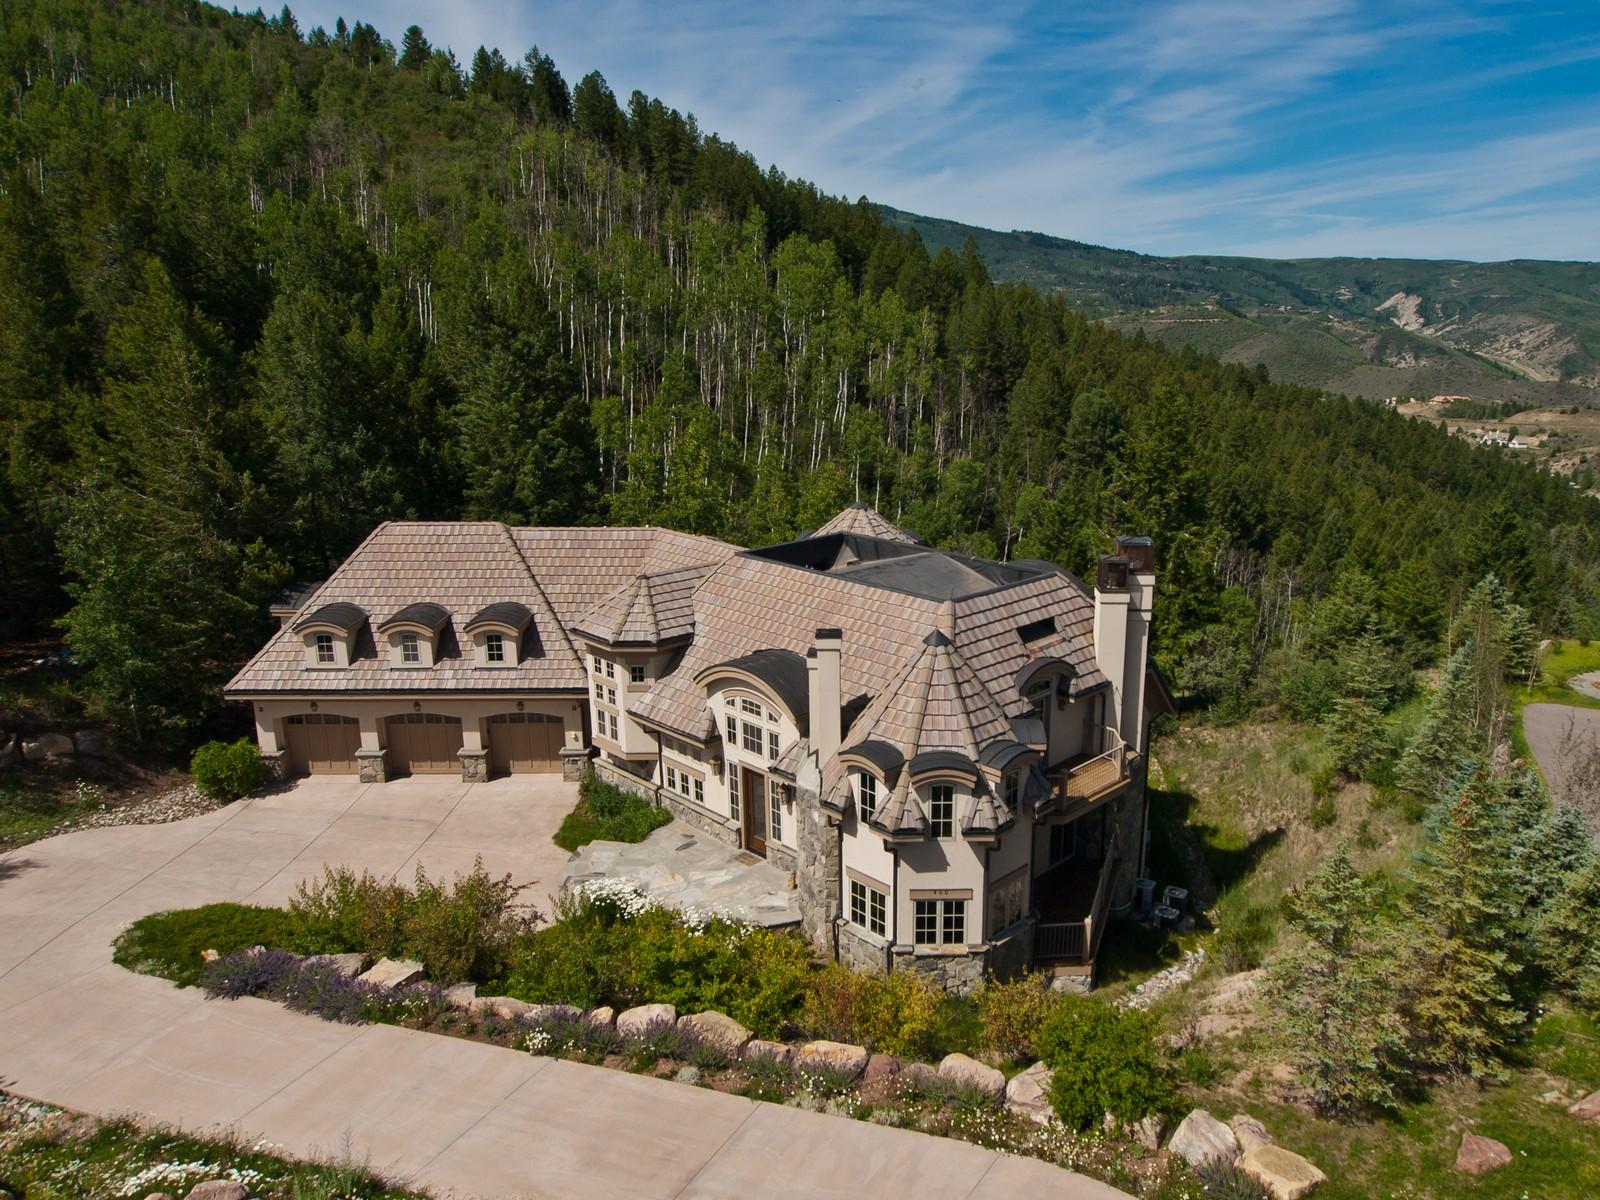 Single Family Home for Sale at Custom Residence in Cordillera 460 El Mirador Edwards, Colorado, 81632 United States